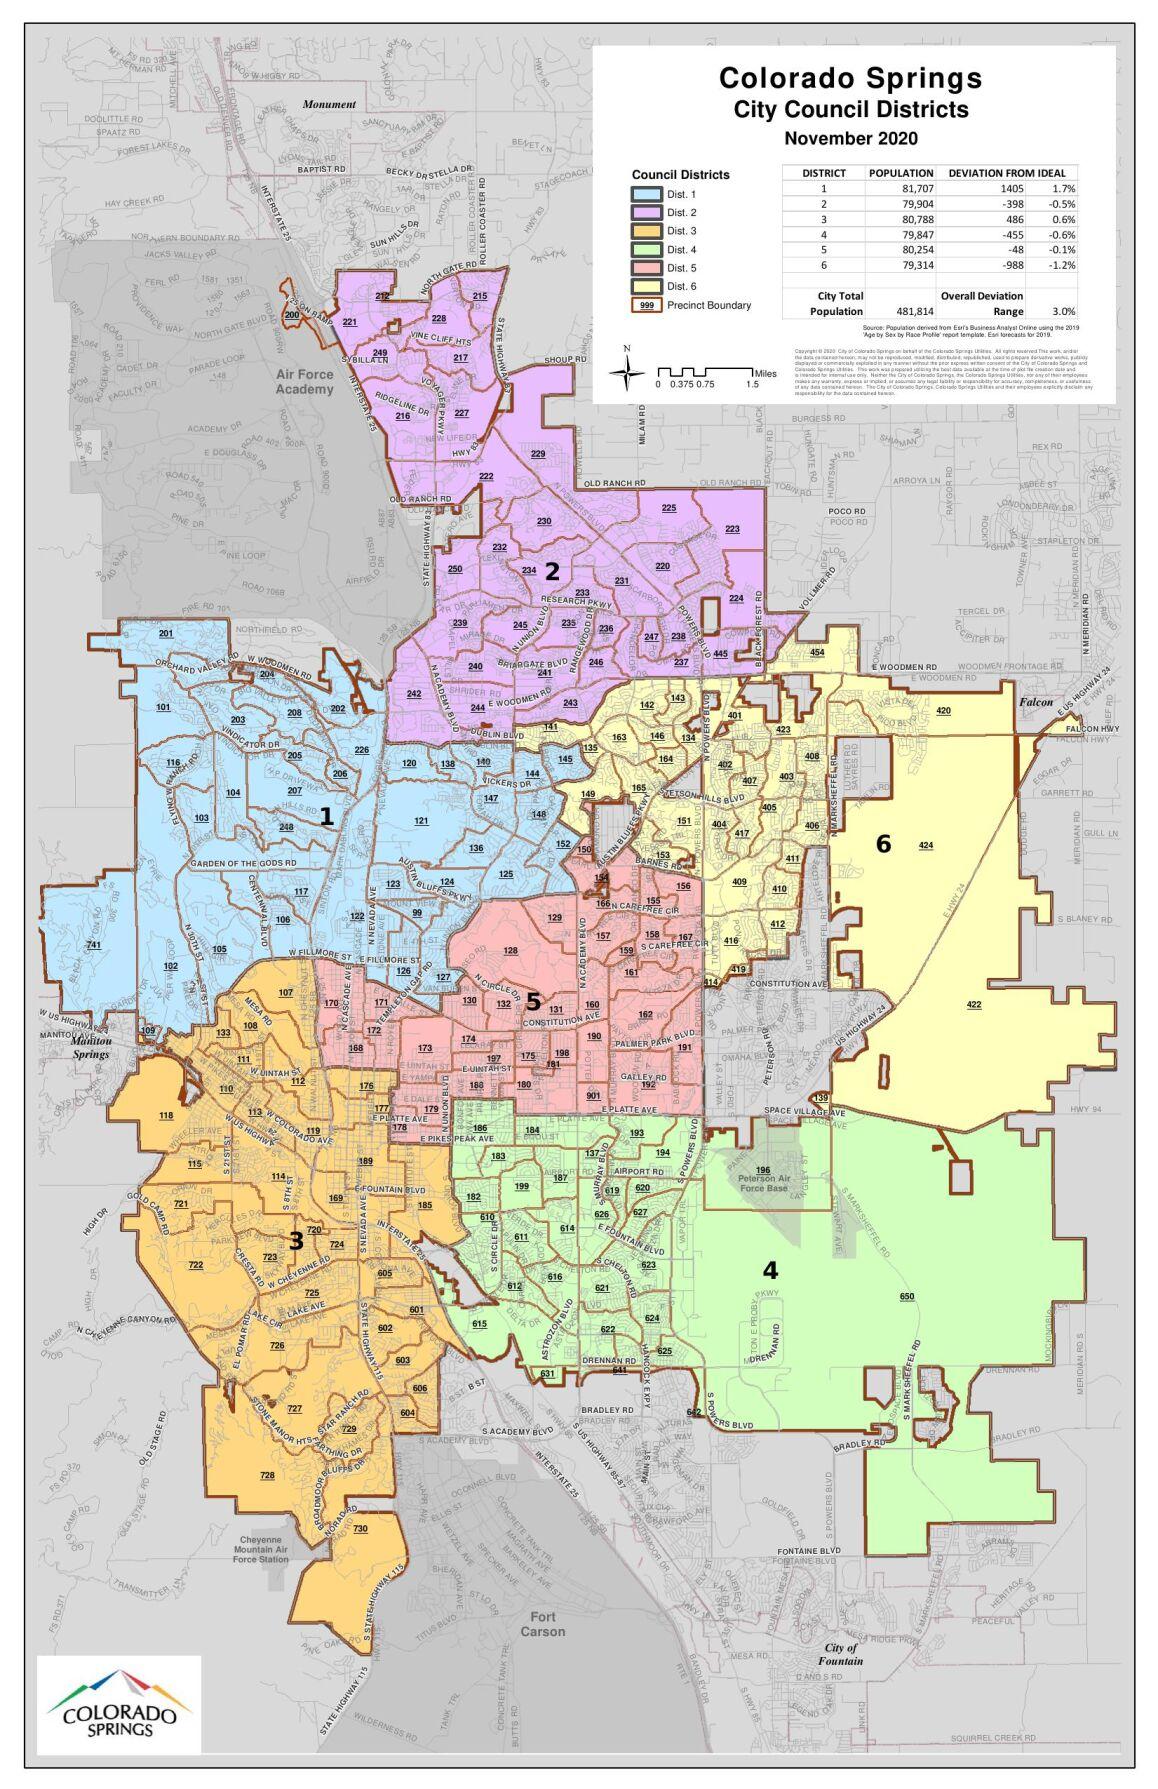 CityCouncilDistricts.pdf